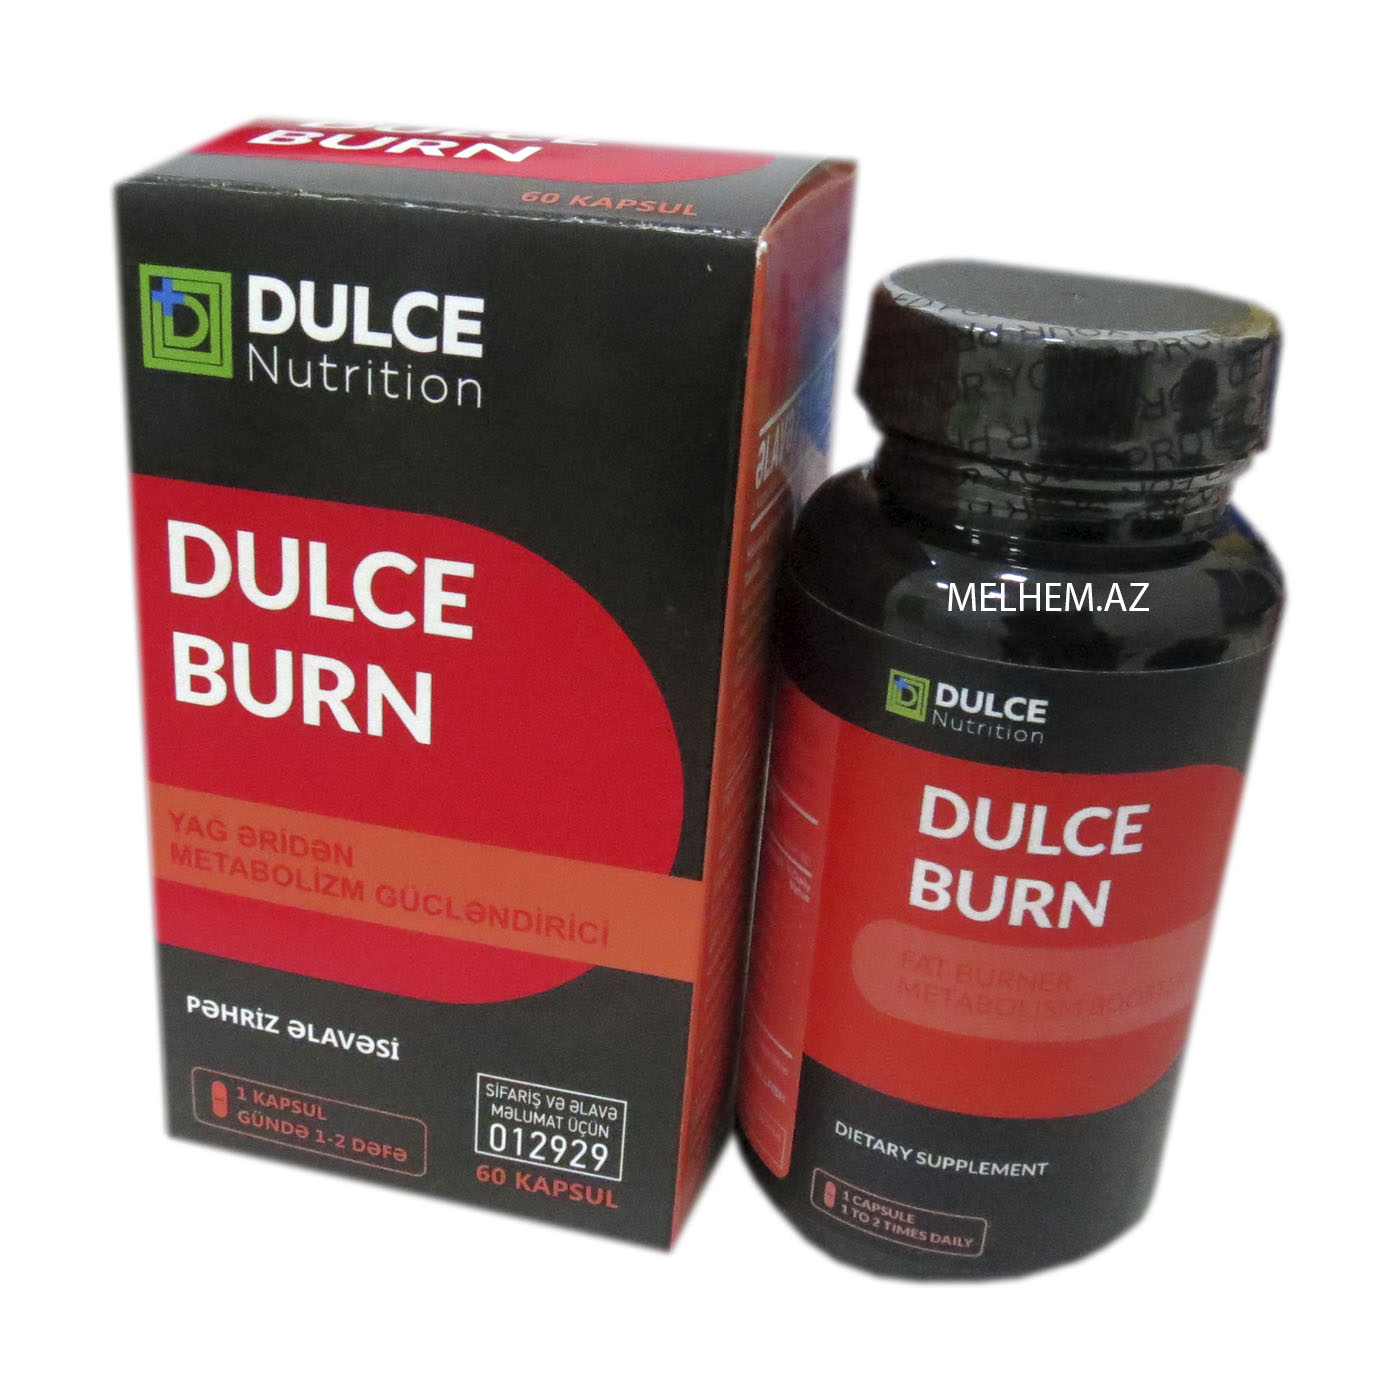 DULCE BURN